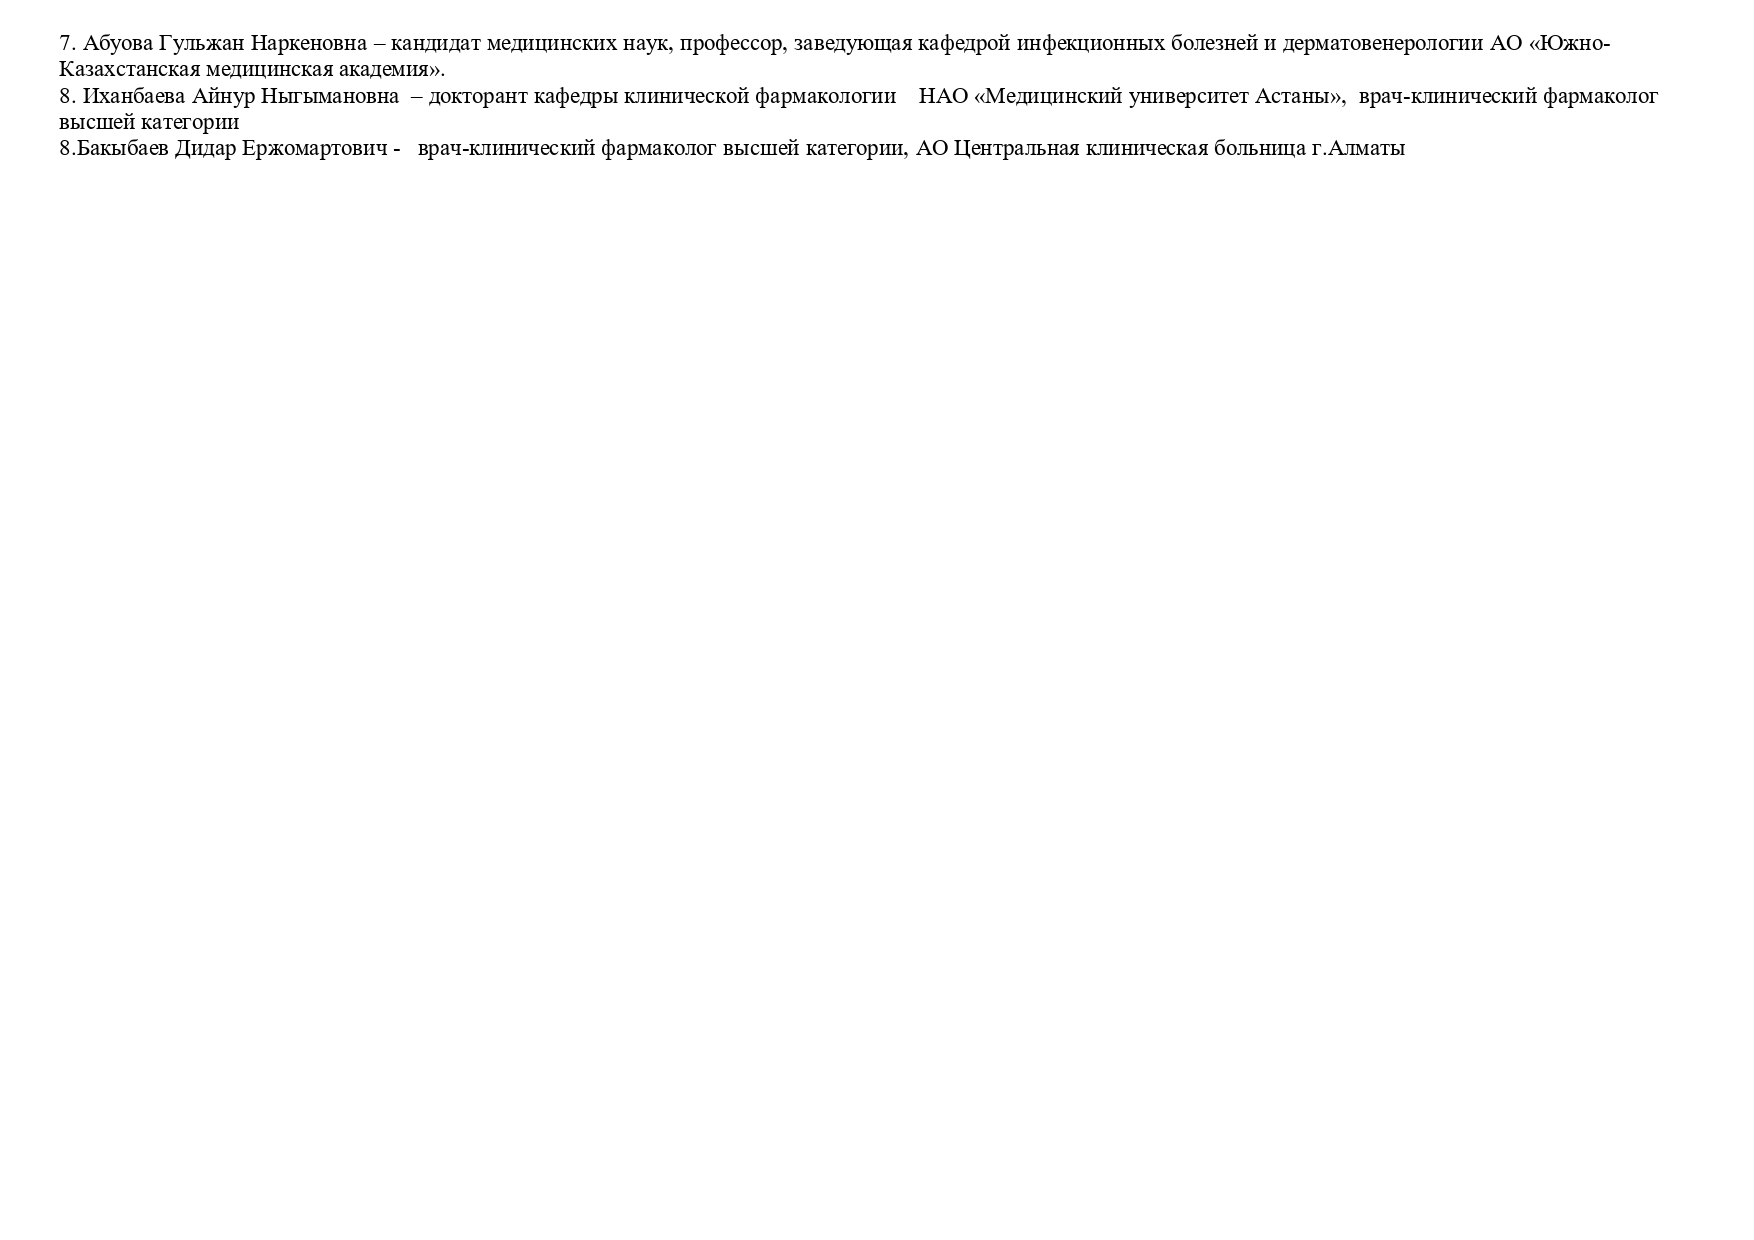 https://inbusiness.kz/ru/images/original/31/images/OIpglAu1.jpg